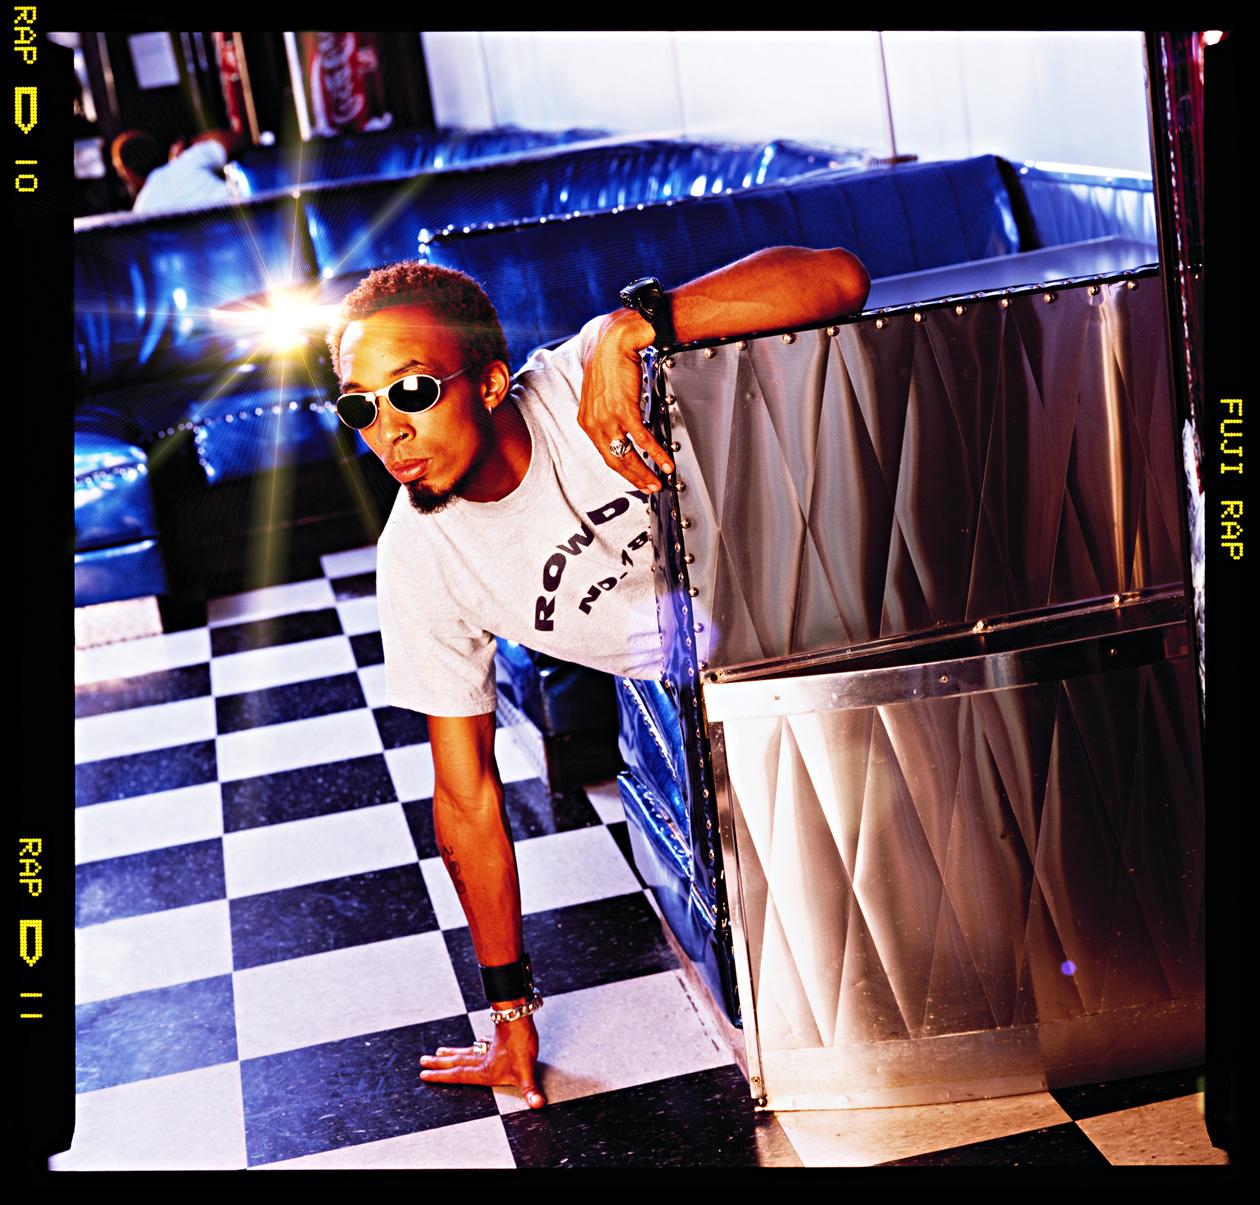 Editorial photography portfolio photo of Dallas Austin by Stephen S T Bradley editorial photographer Dublin, Ireland